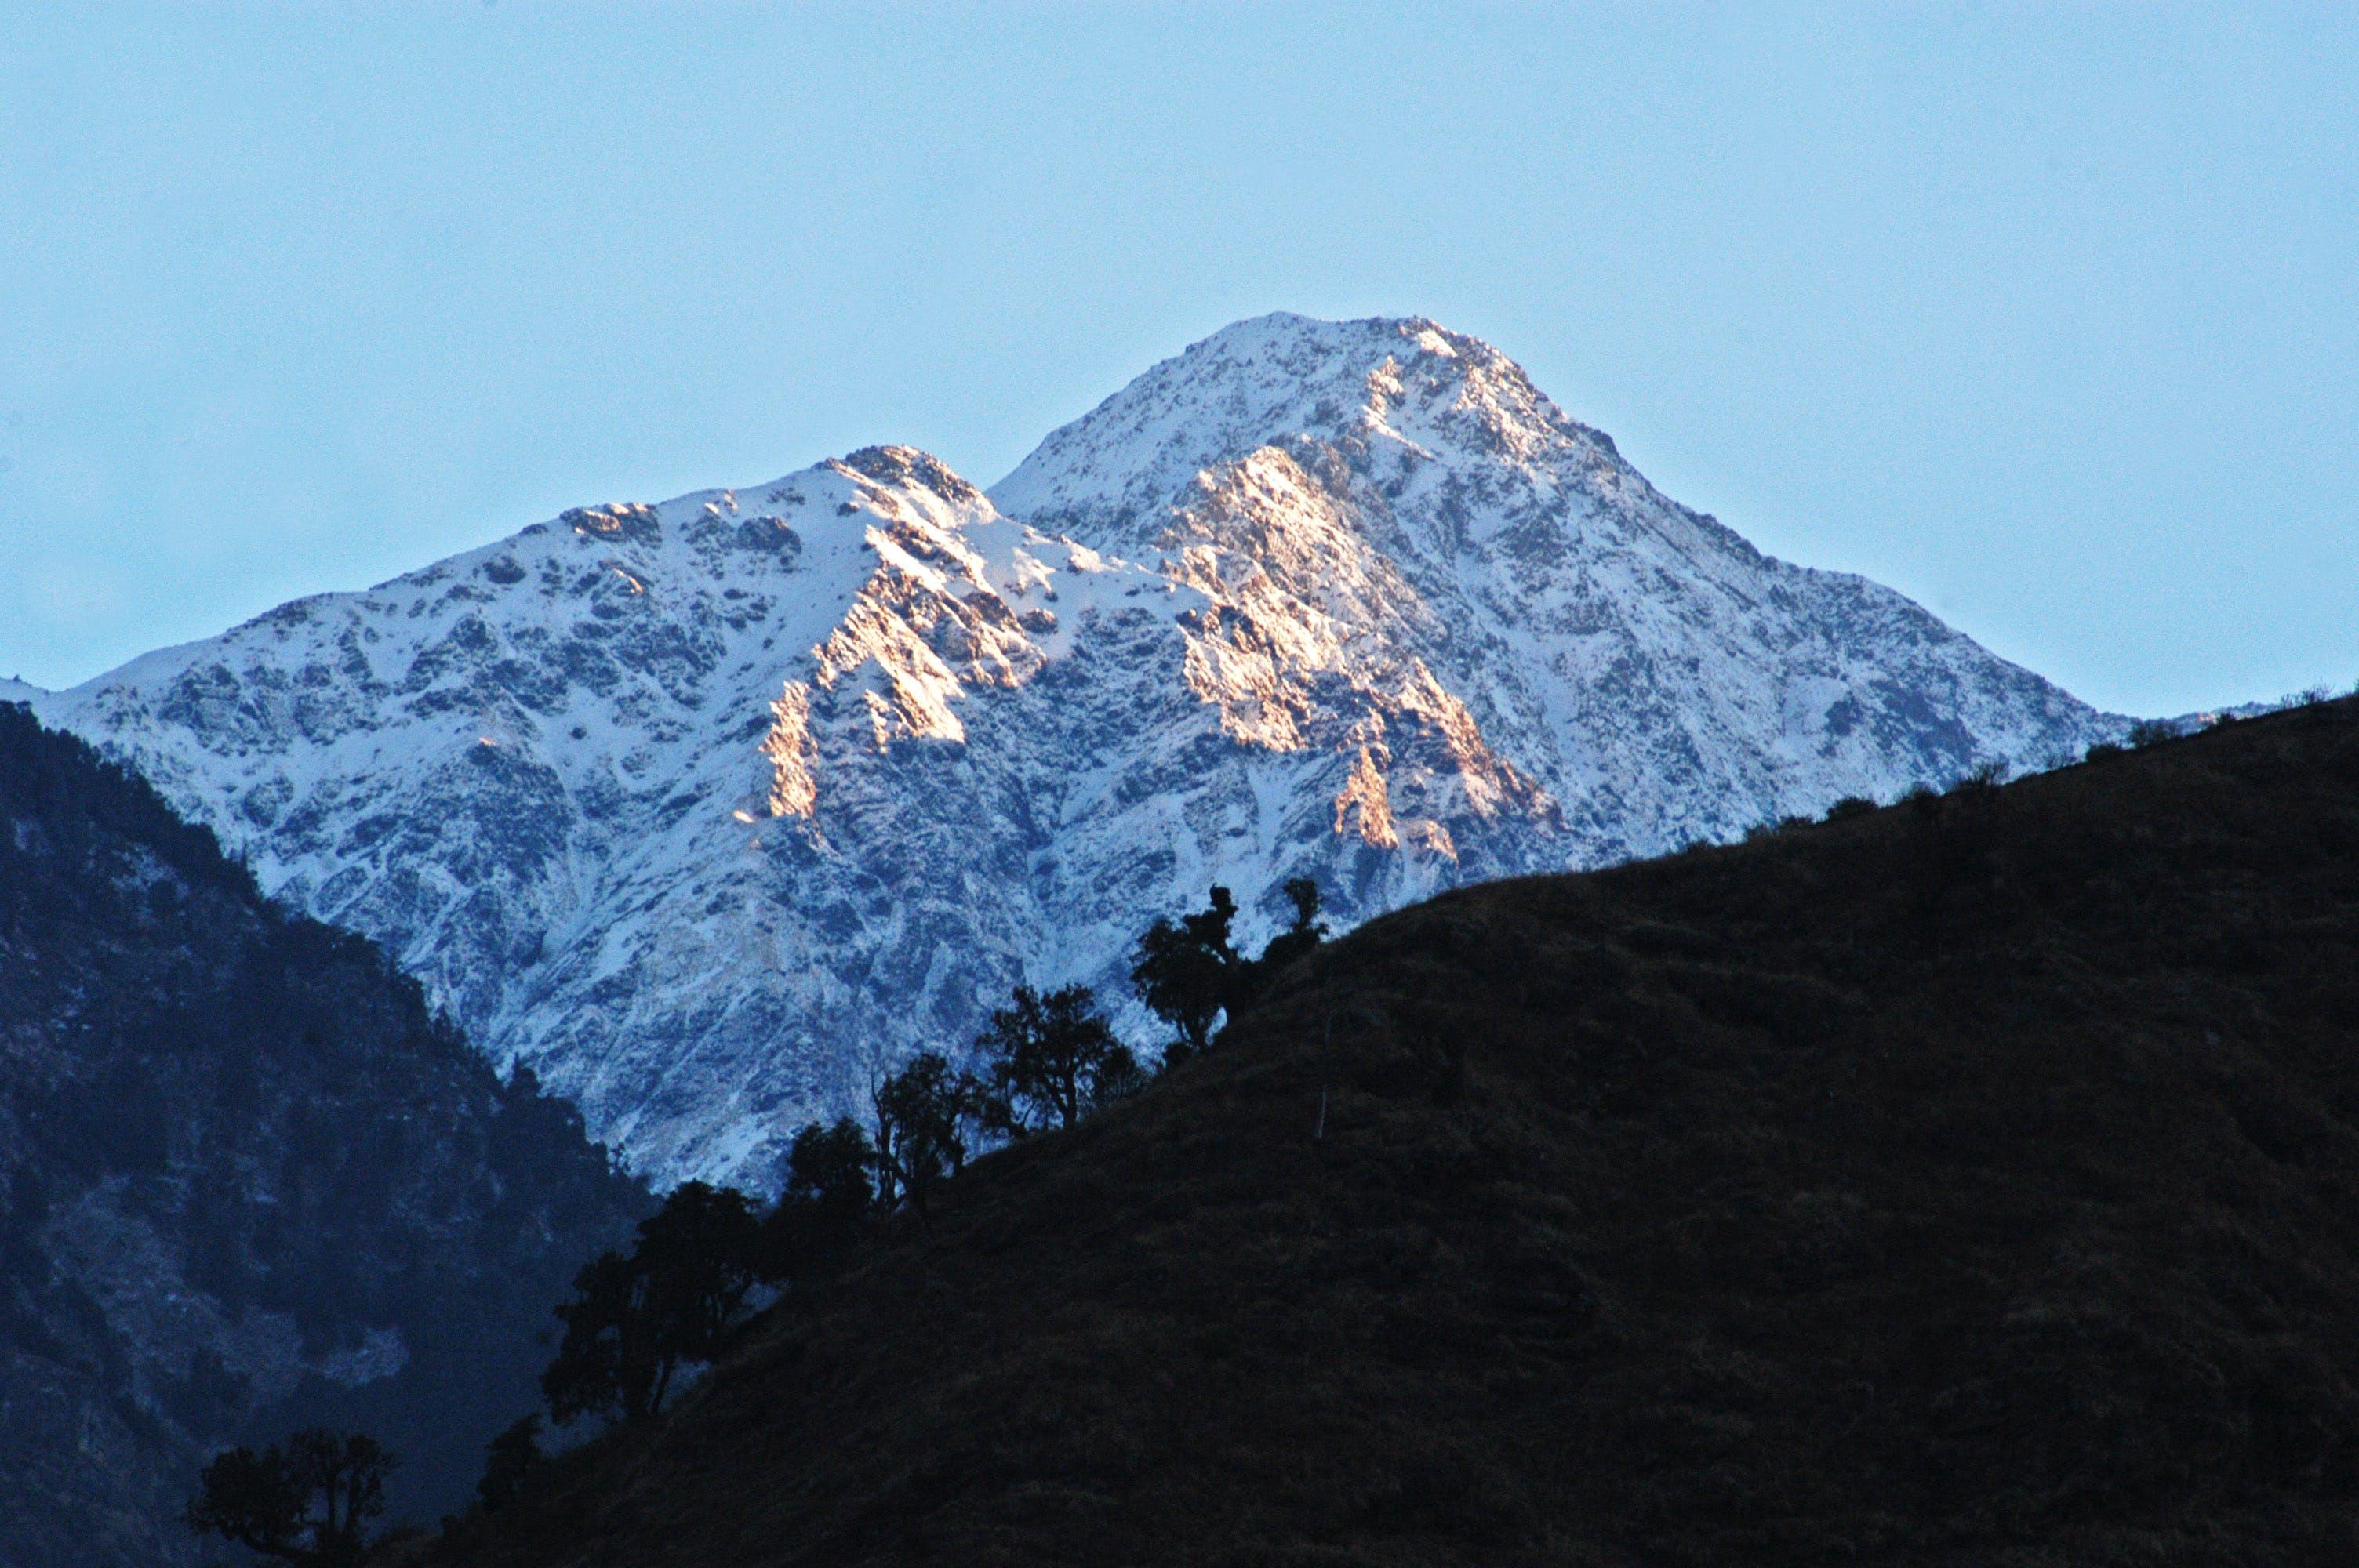 Free stock photo of himalayas, india, mountain, nature photography